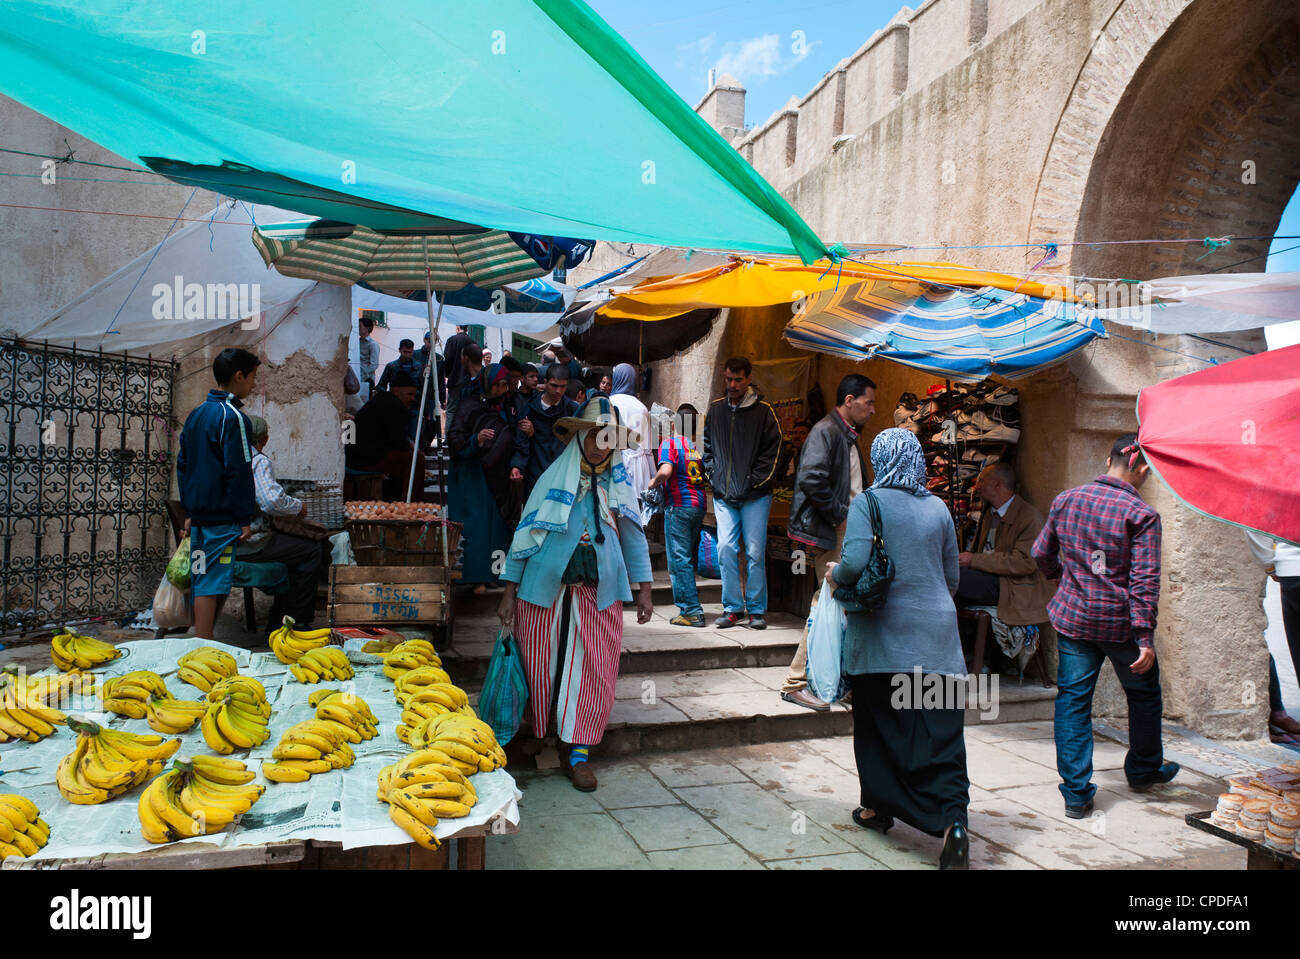 Straßenmarkt, Medina, Tetouan, UNESCO-Weltkulturerbe, Marokko, Nordafrika, Afrika Stockbild